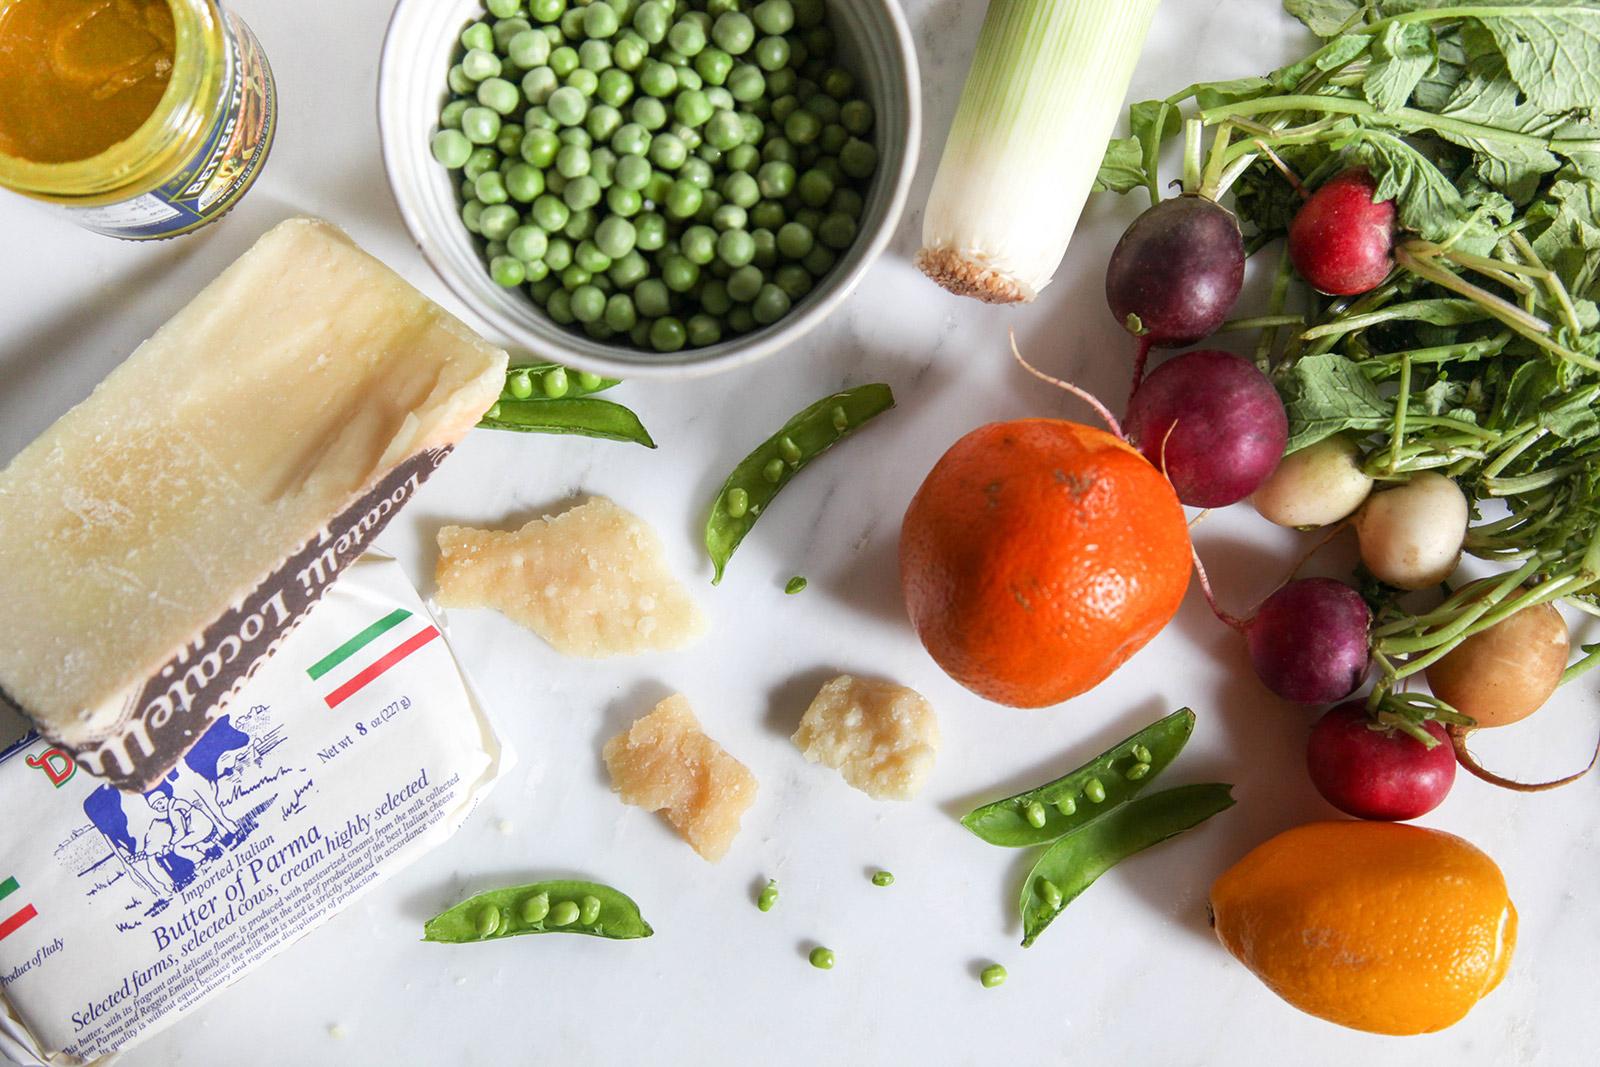 Ingredients for Spring Pea Salad with Leeks, Radish, Citrus Zest and Aged Parmigiano-Reggiano & Pecorino-Romano Cheeses